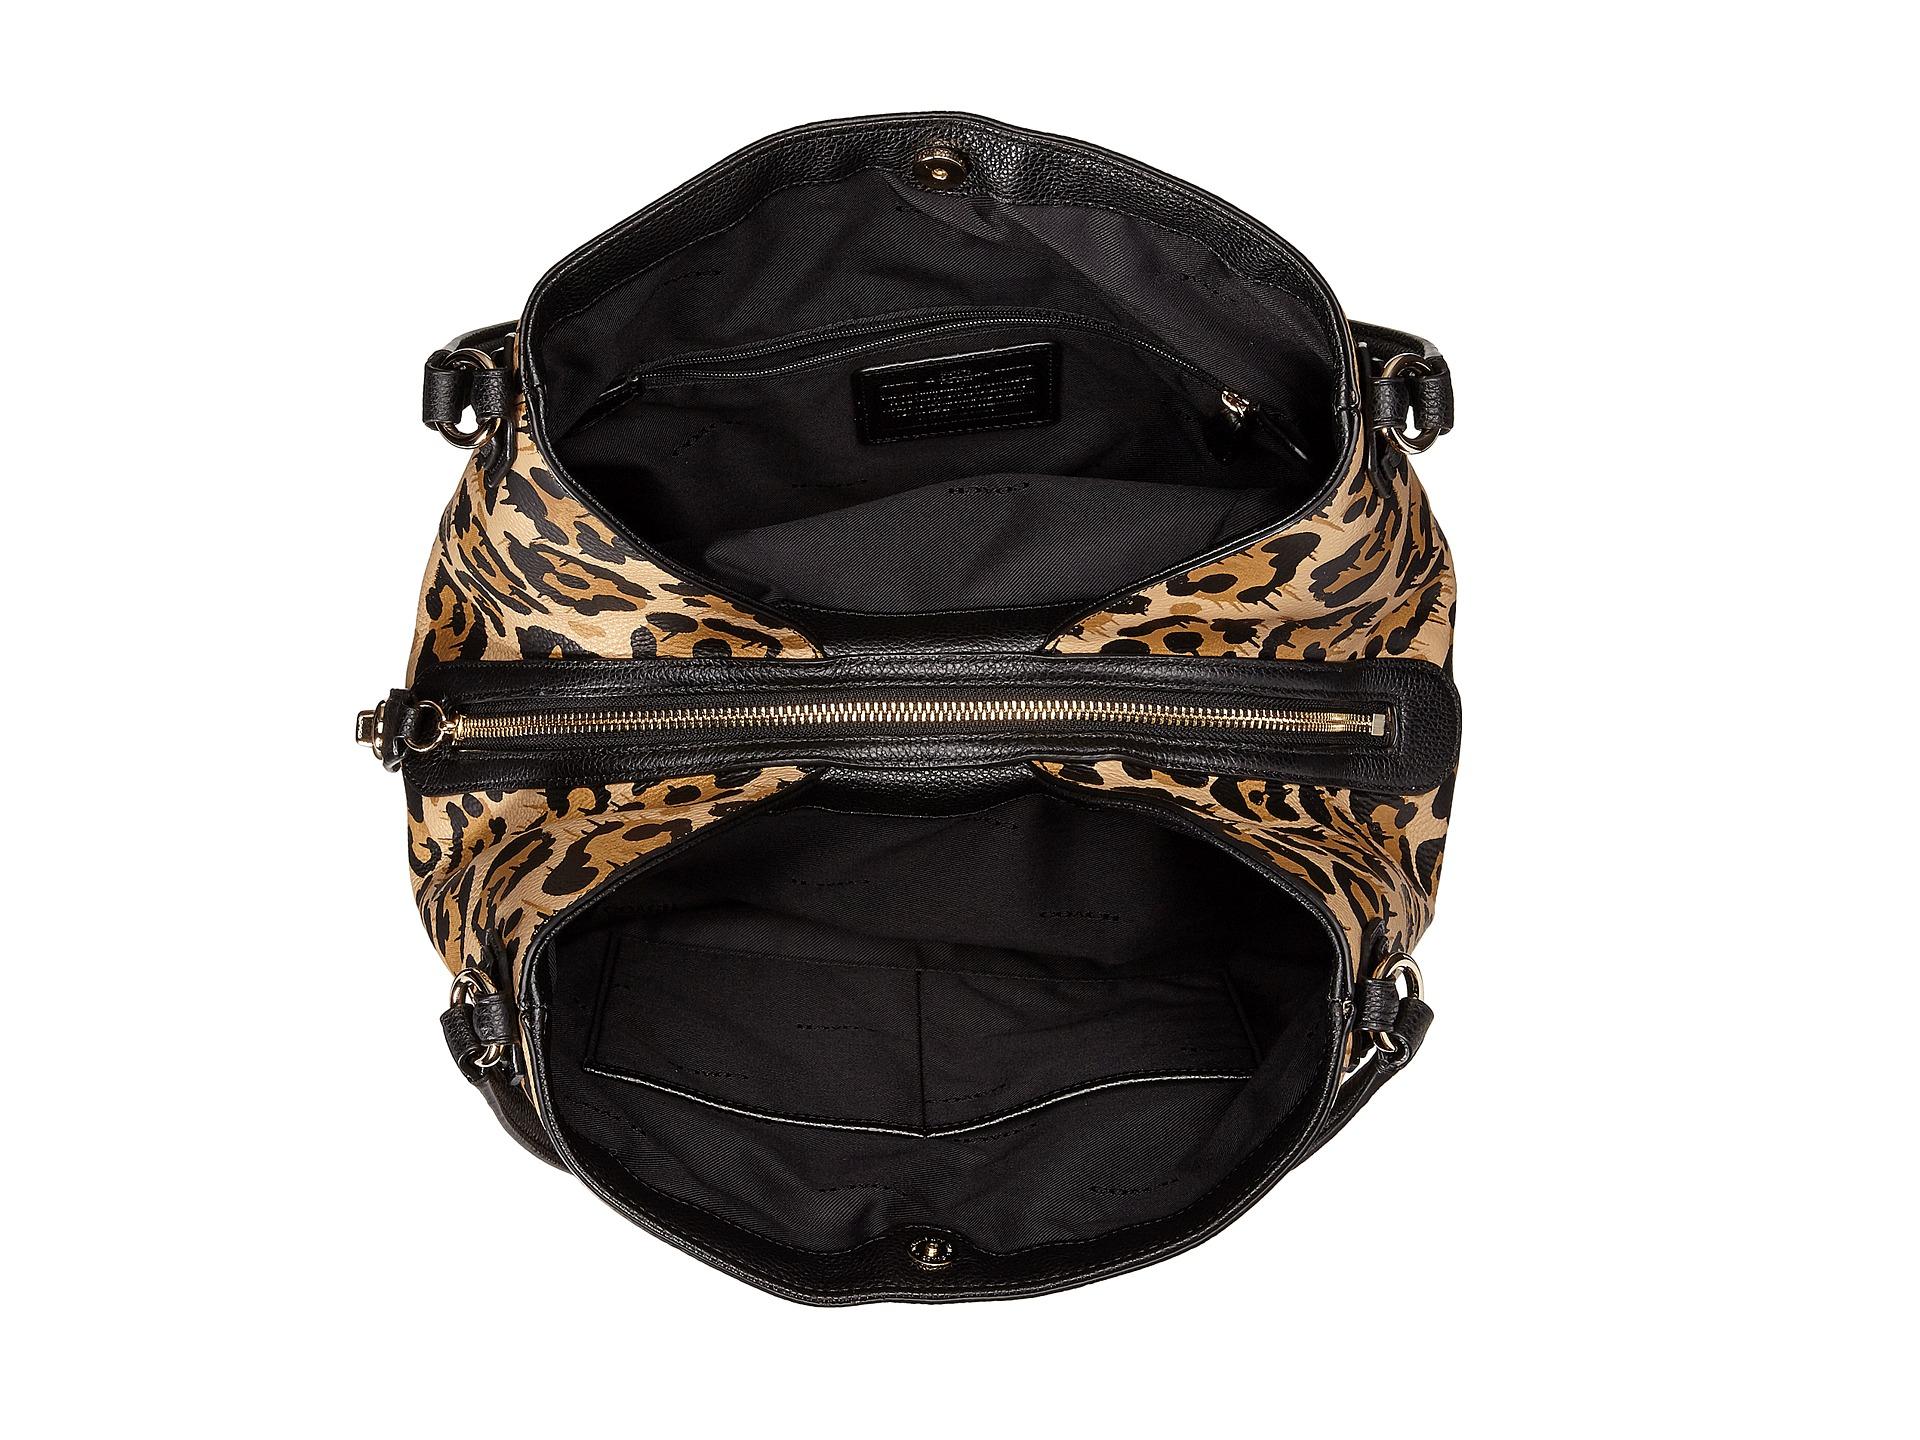 173b06d10c ... france lyst coach leopard ocelot edie 31 shoulder bag 9aa15 6fed6